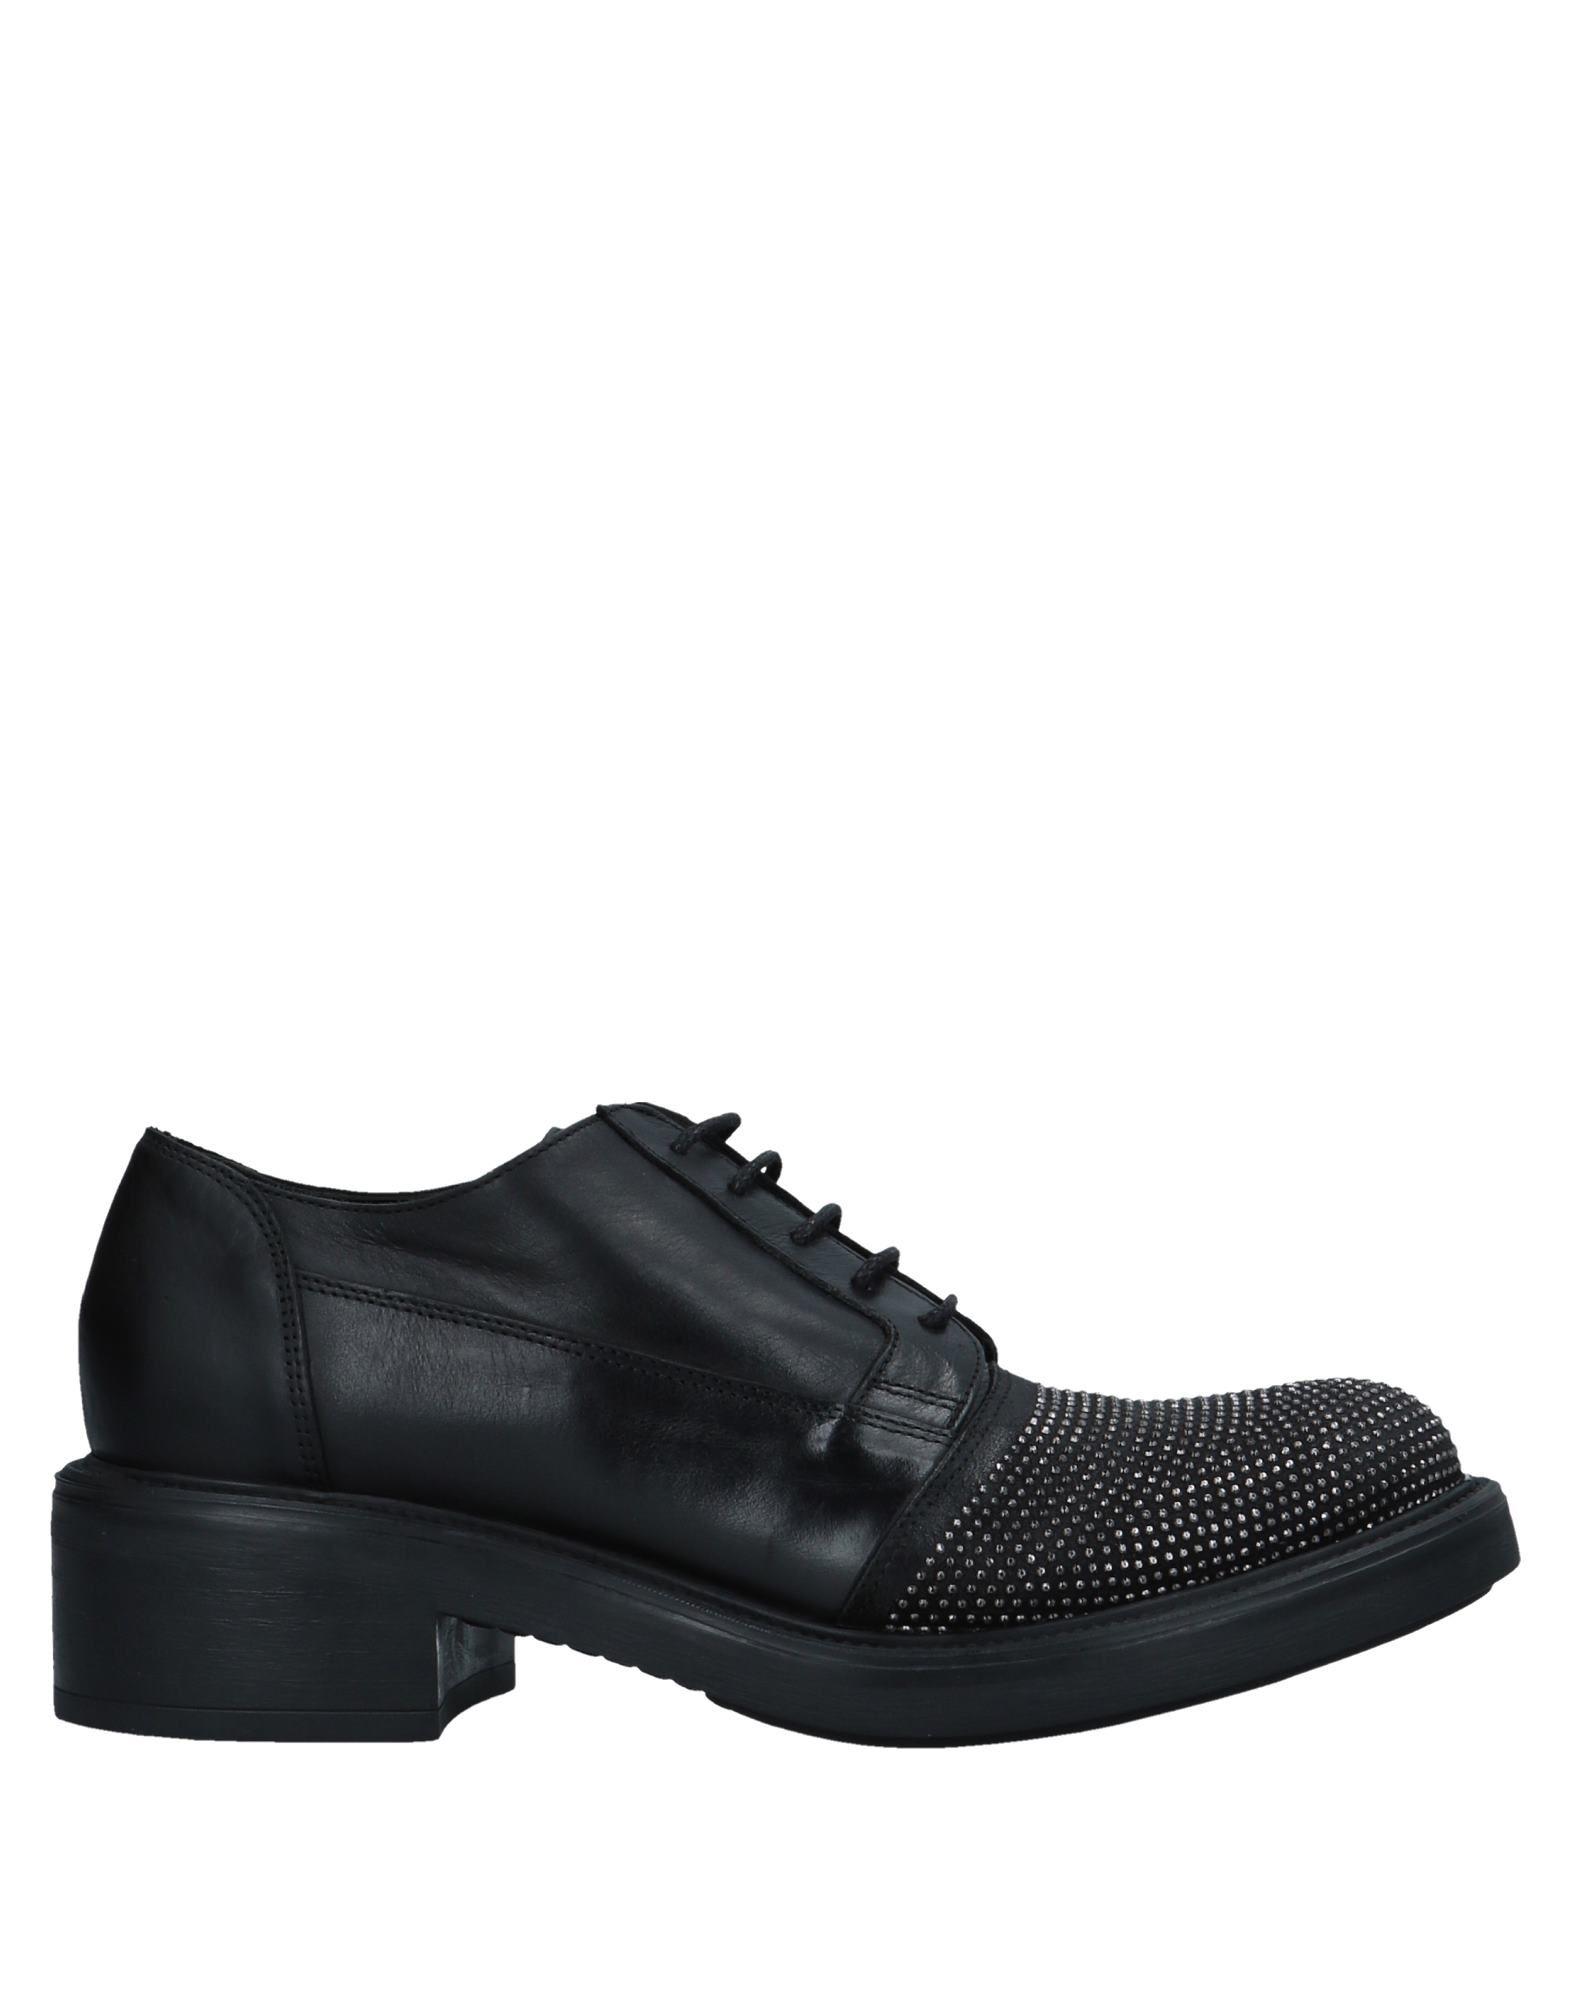 Gut um Schnürschuhe billige Schuhe zu tragenLino Ricci Schnürschuhe um Damen  11543035ML 31a5b9